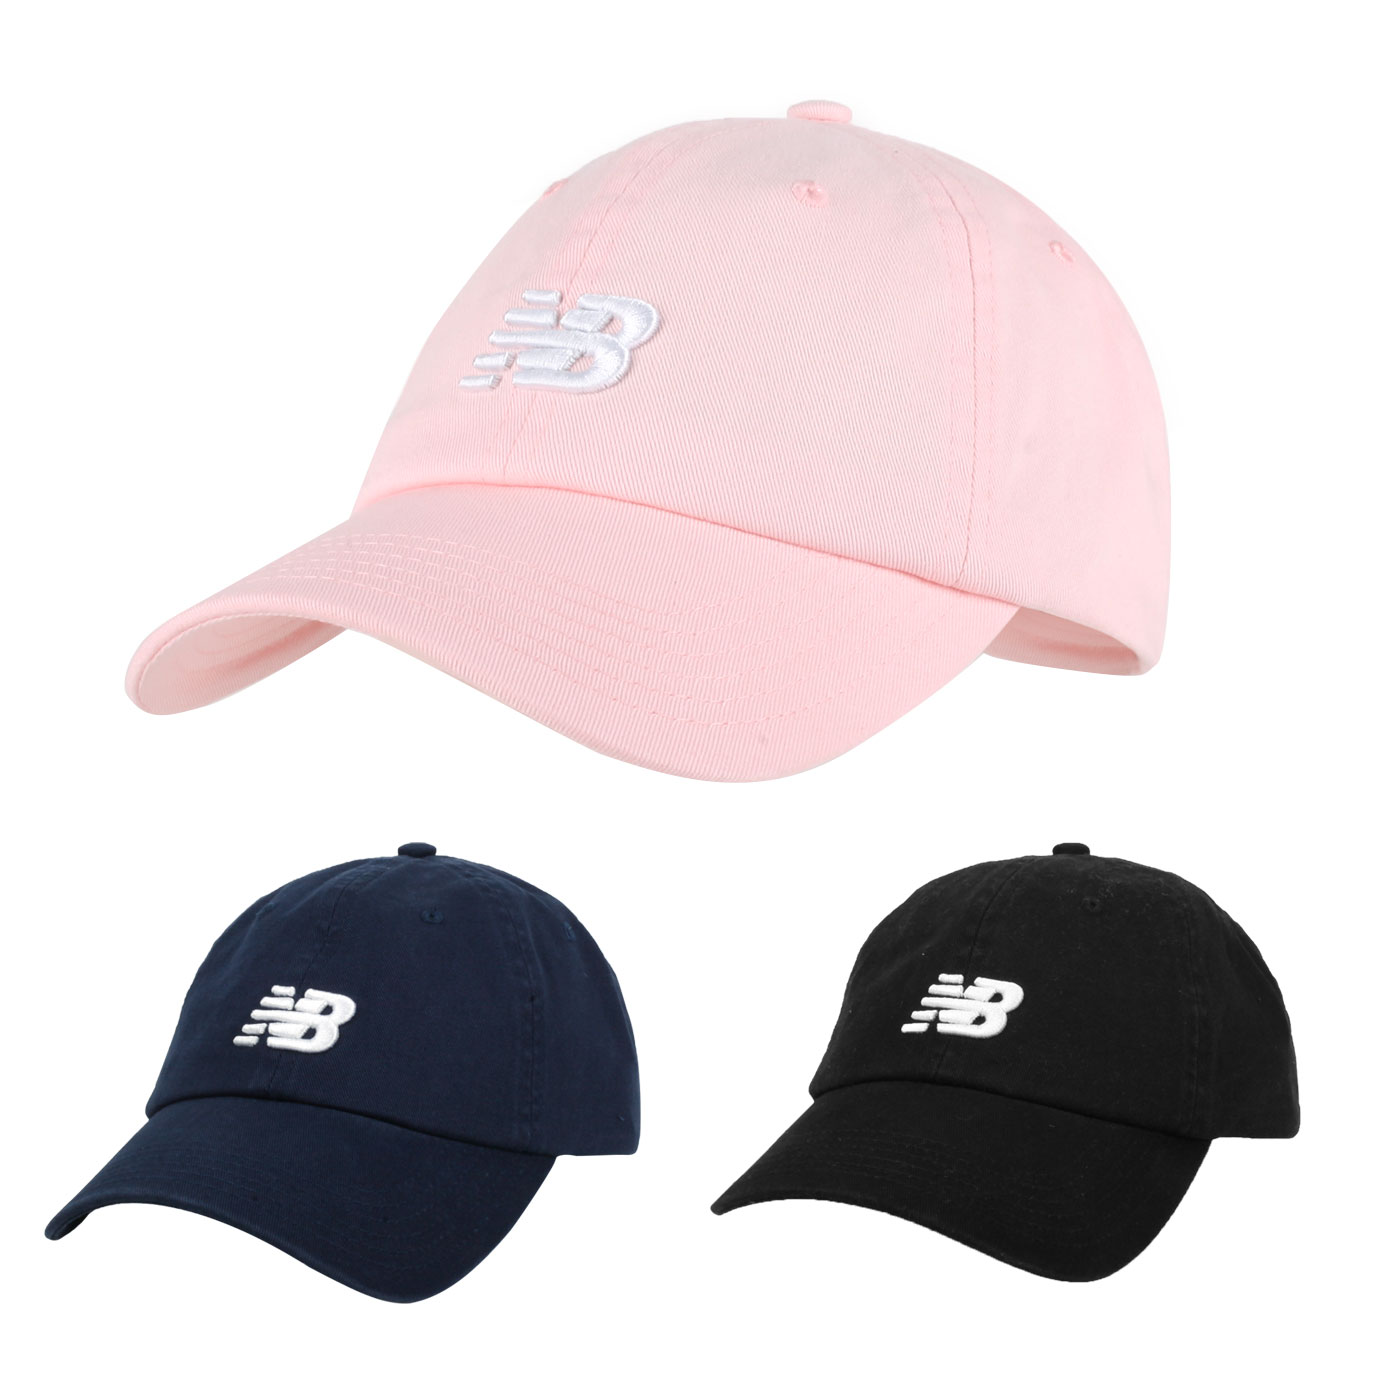 NEW BALANCE 棒球帽 LAH91014BK